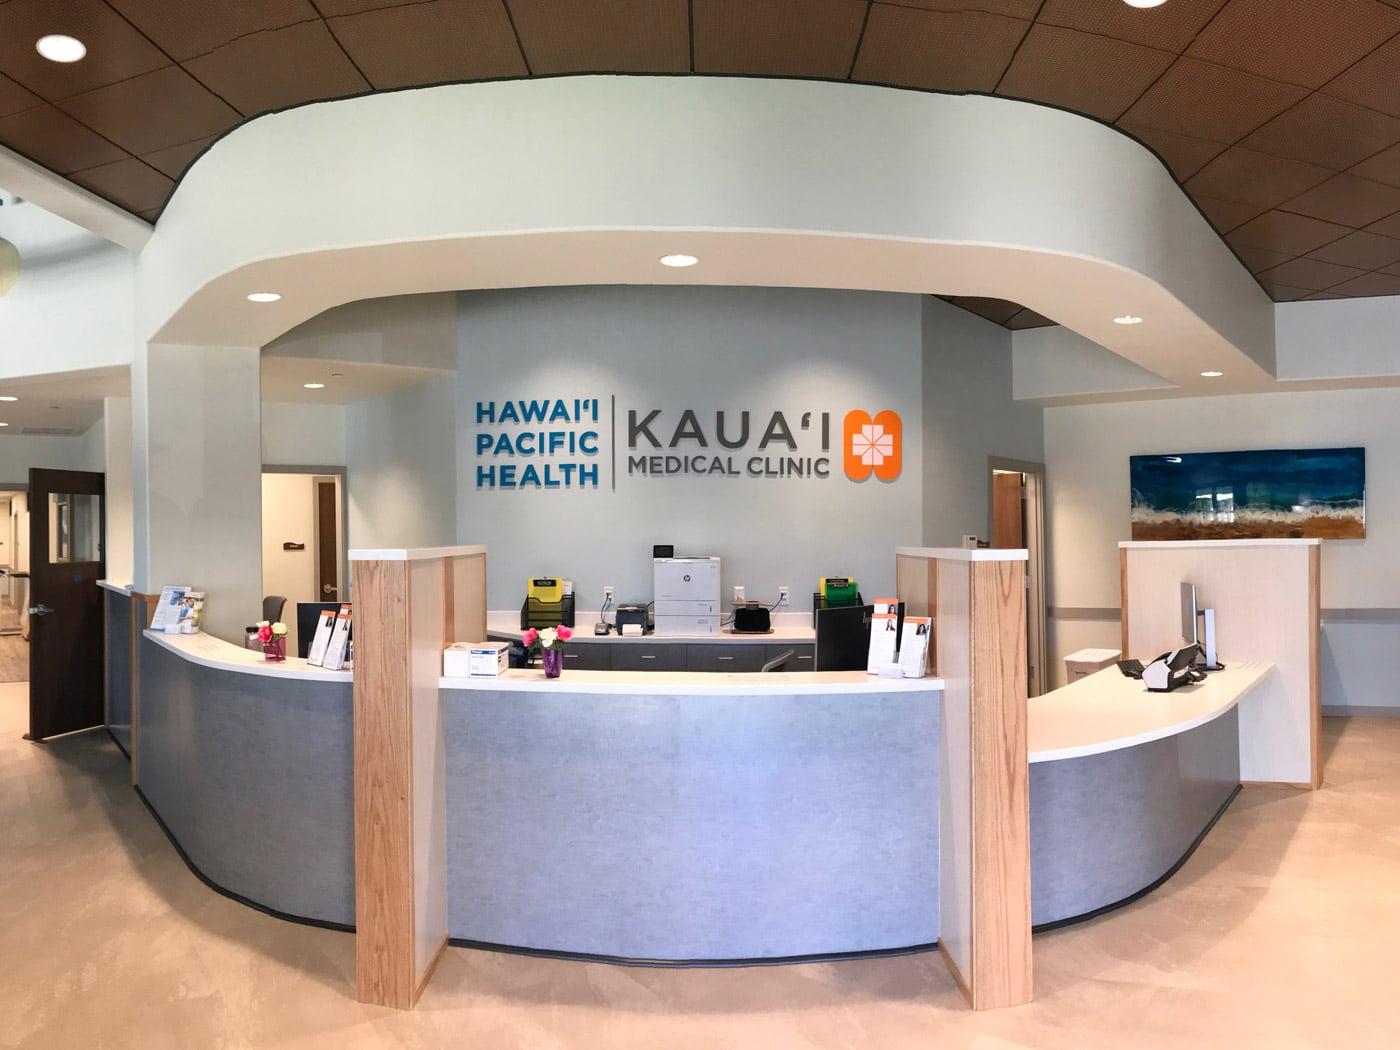 Kauai Village Shopping Center - Kauai Medical Clinic